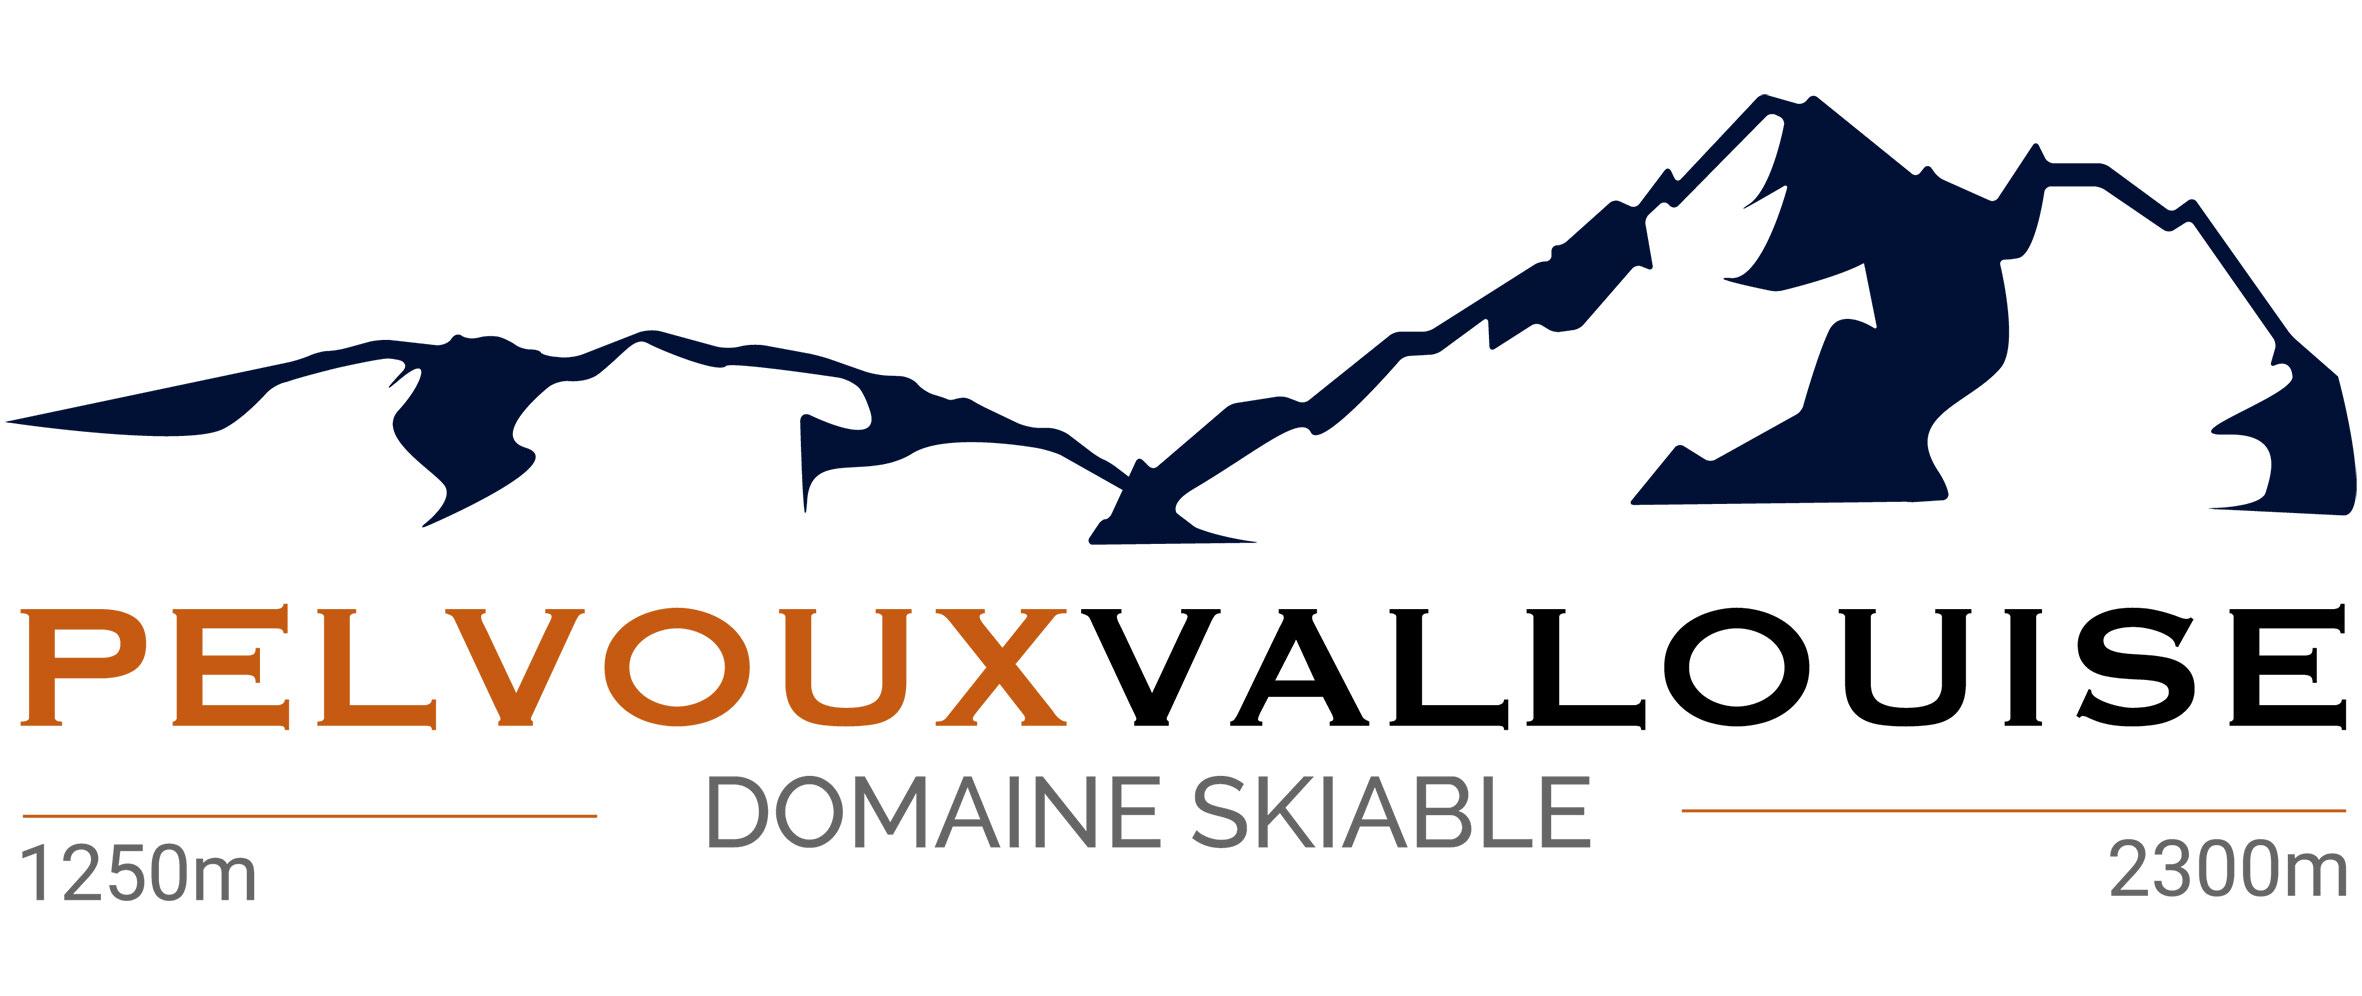 Station de ski Pelvoux